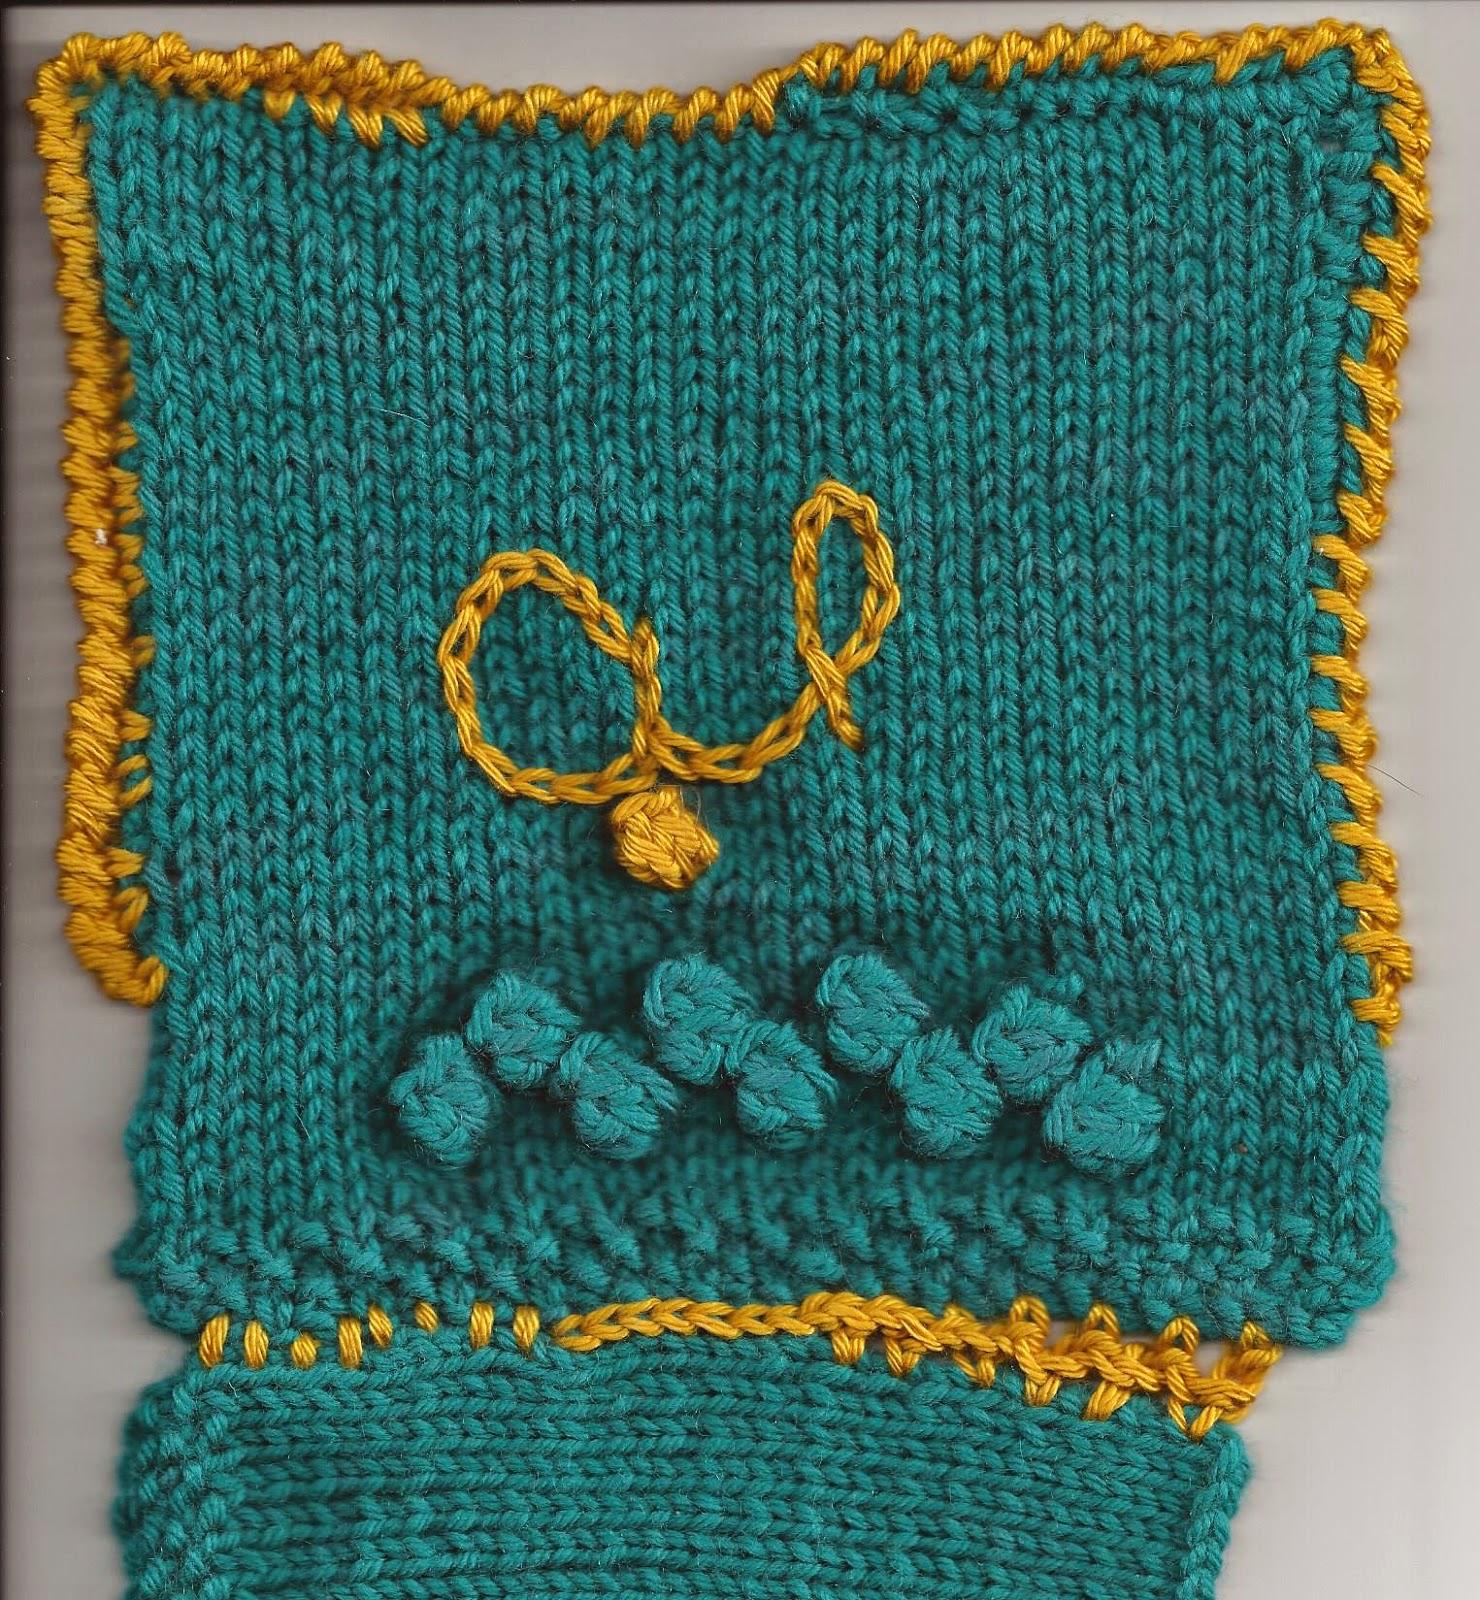 Stitch Whisper Exploring Crochet Stitches And Yarns